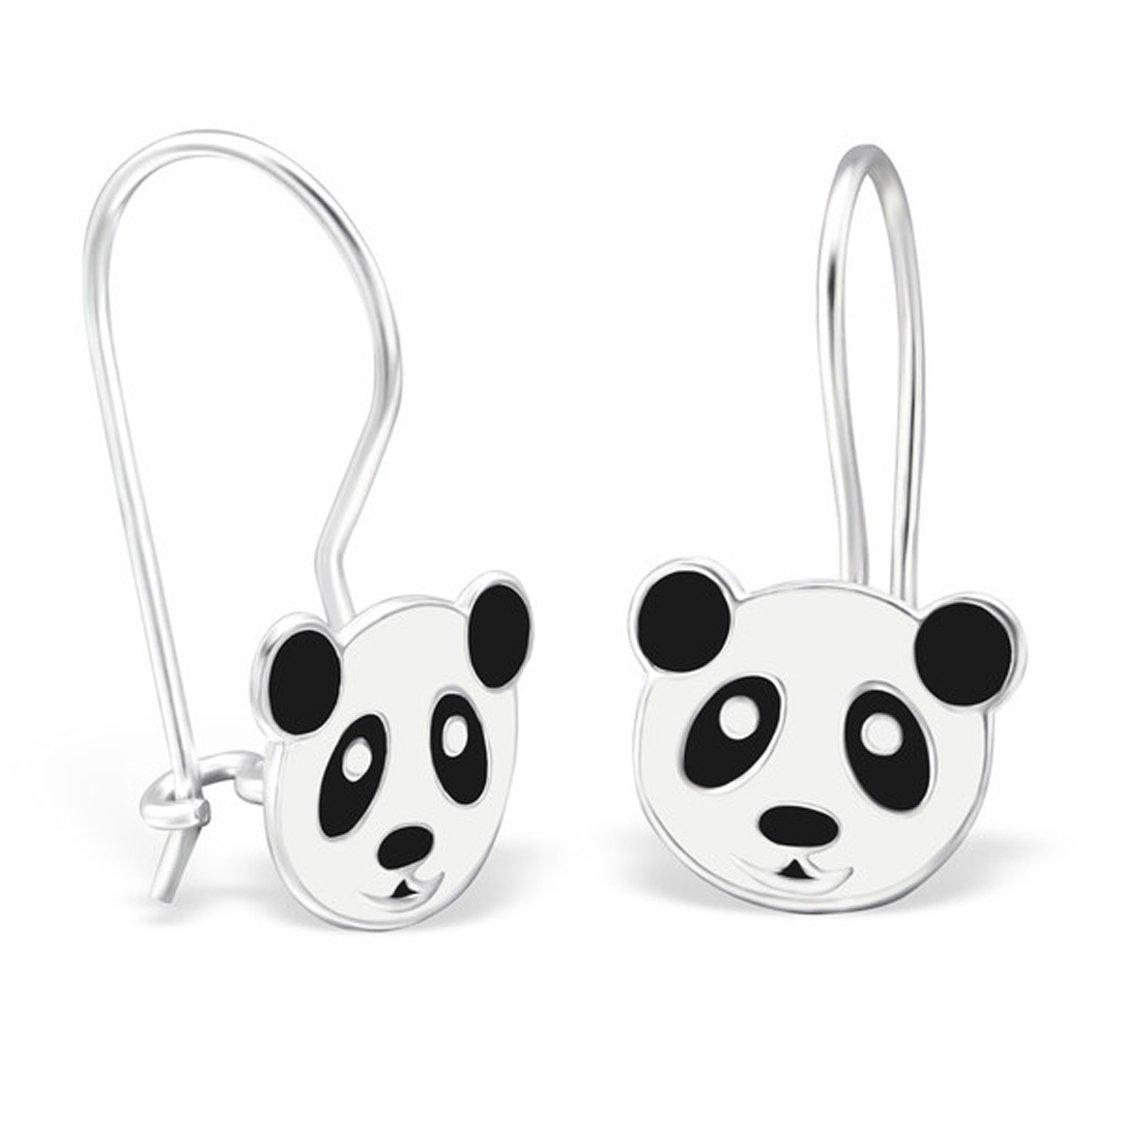 Cute Blak White Panda Bear Silver Earrings Dangle Girls 925 Stering Silver Nickle Free (28645)